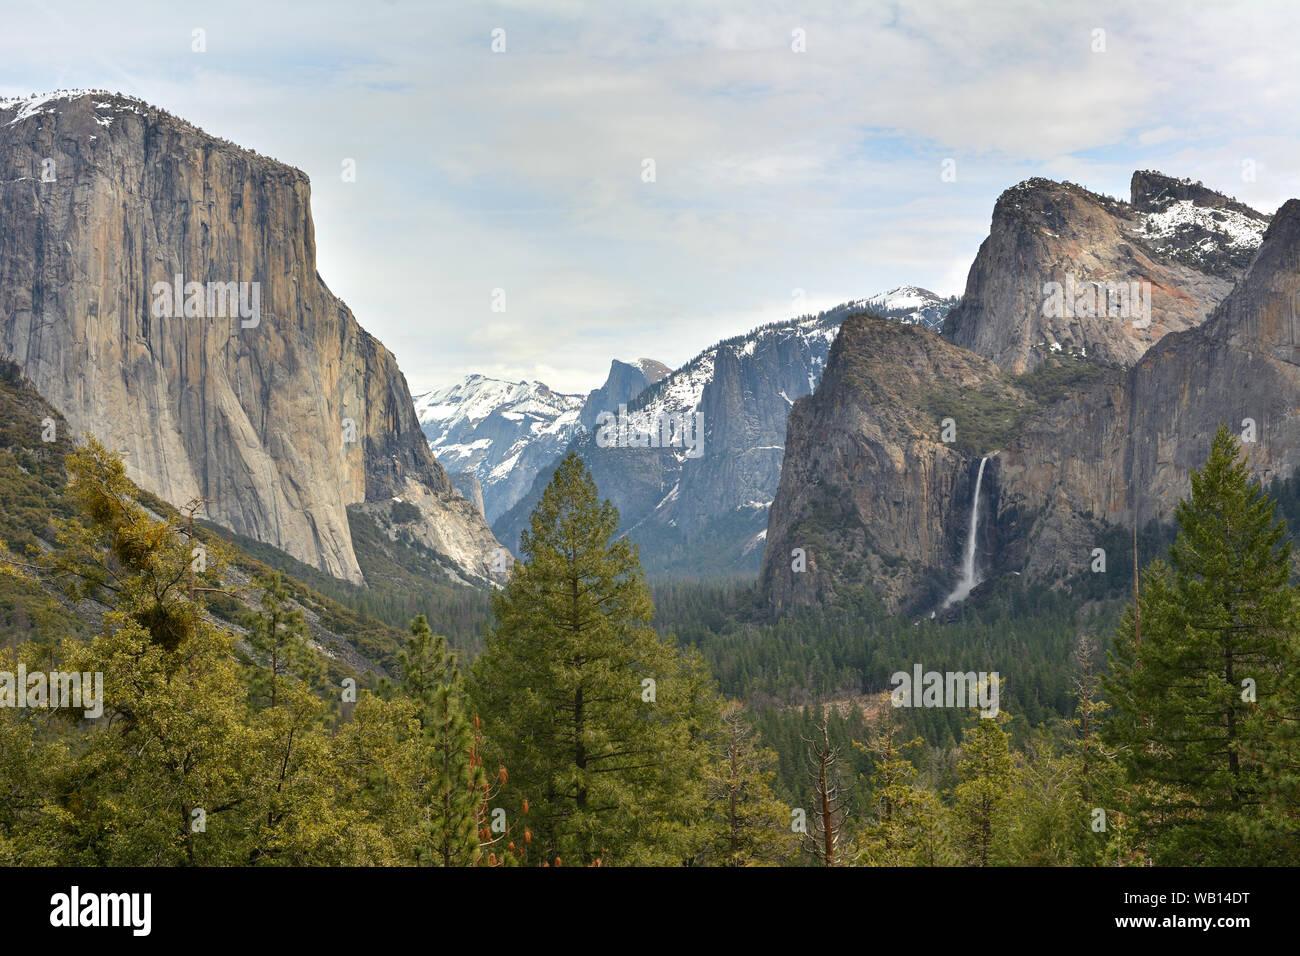 Bridalveil Fall - Yosemite National Park, California, United States Banque D'Images